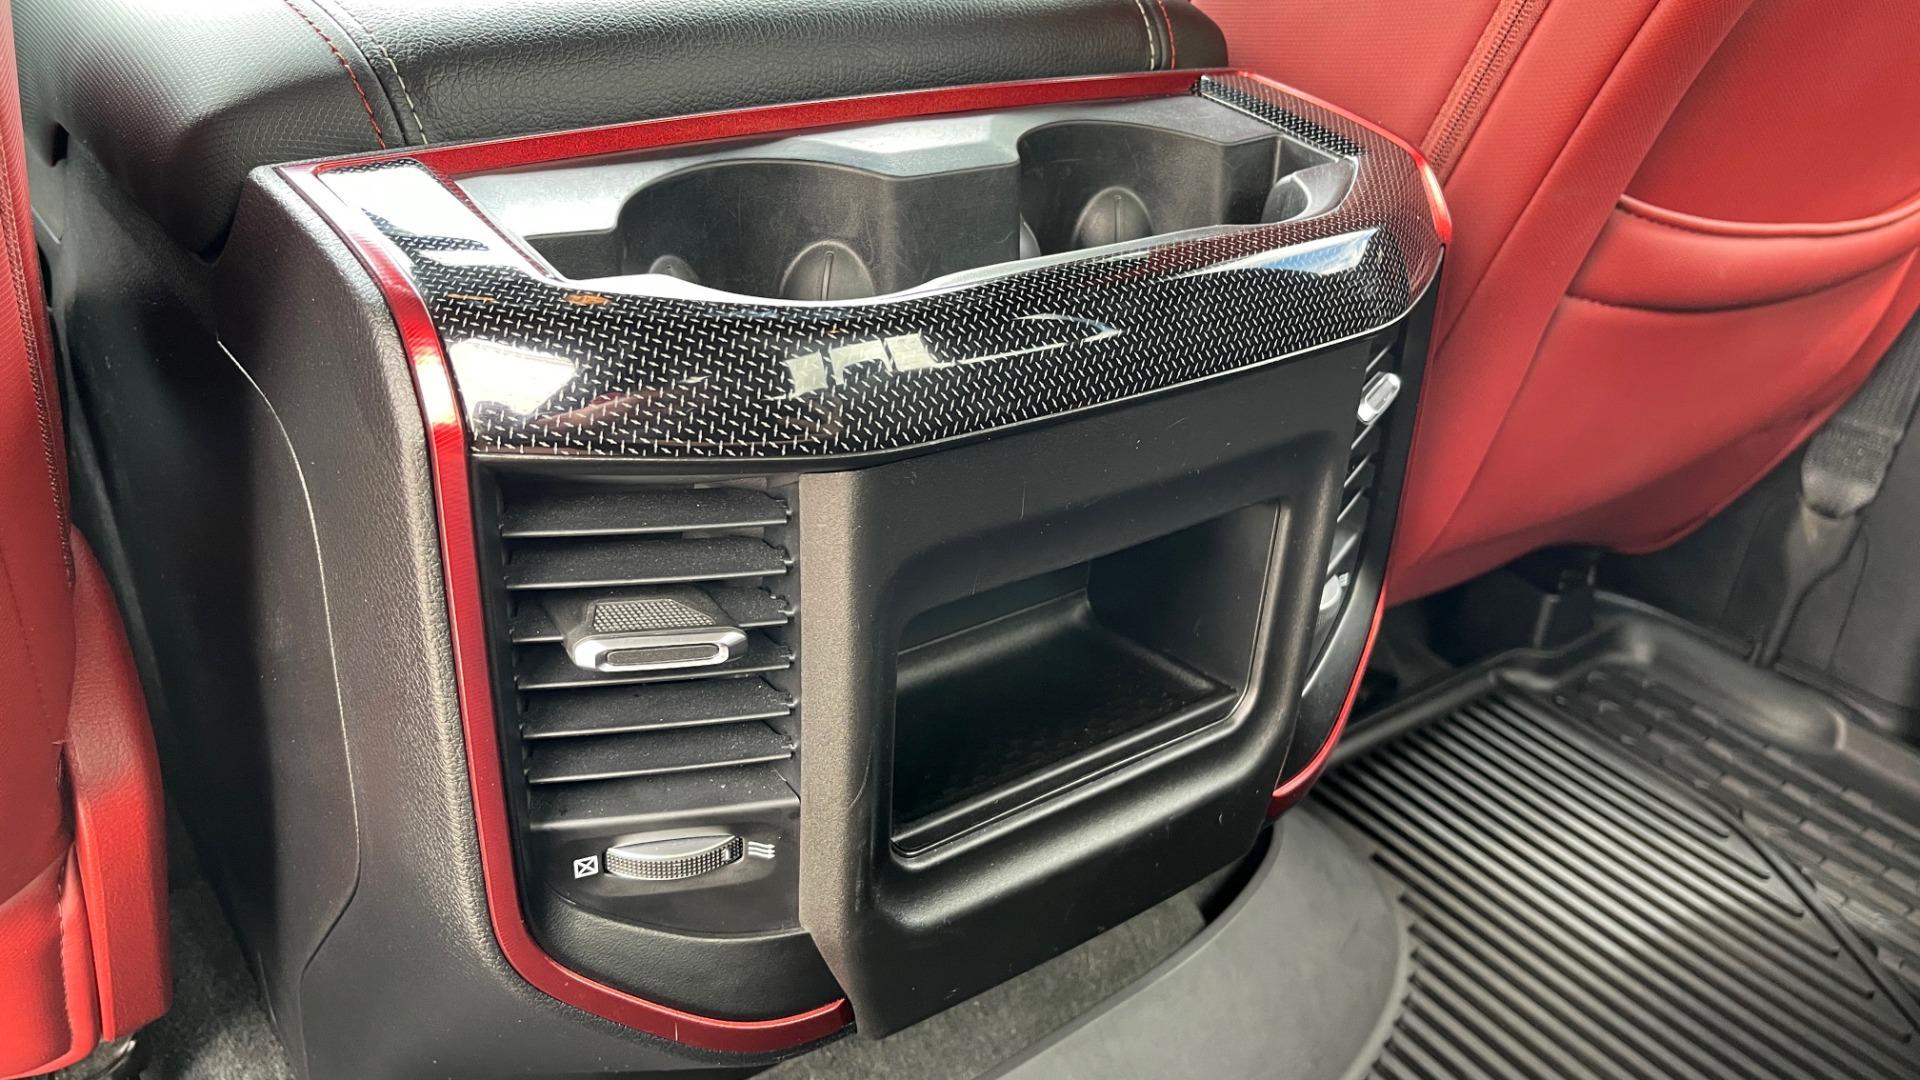 Used 2019 Ram 1500 REBEL QUADCAB 4X4 / 5.7L HEMI / 8-SPD AUTO / REMOTE START / PARK ASSIST for sale $44,495 at Formula Imports in Charlotte NC 28227 55